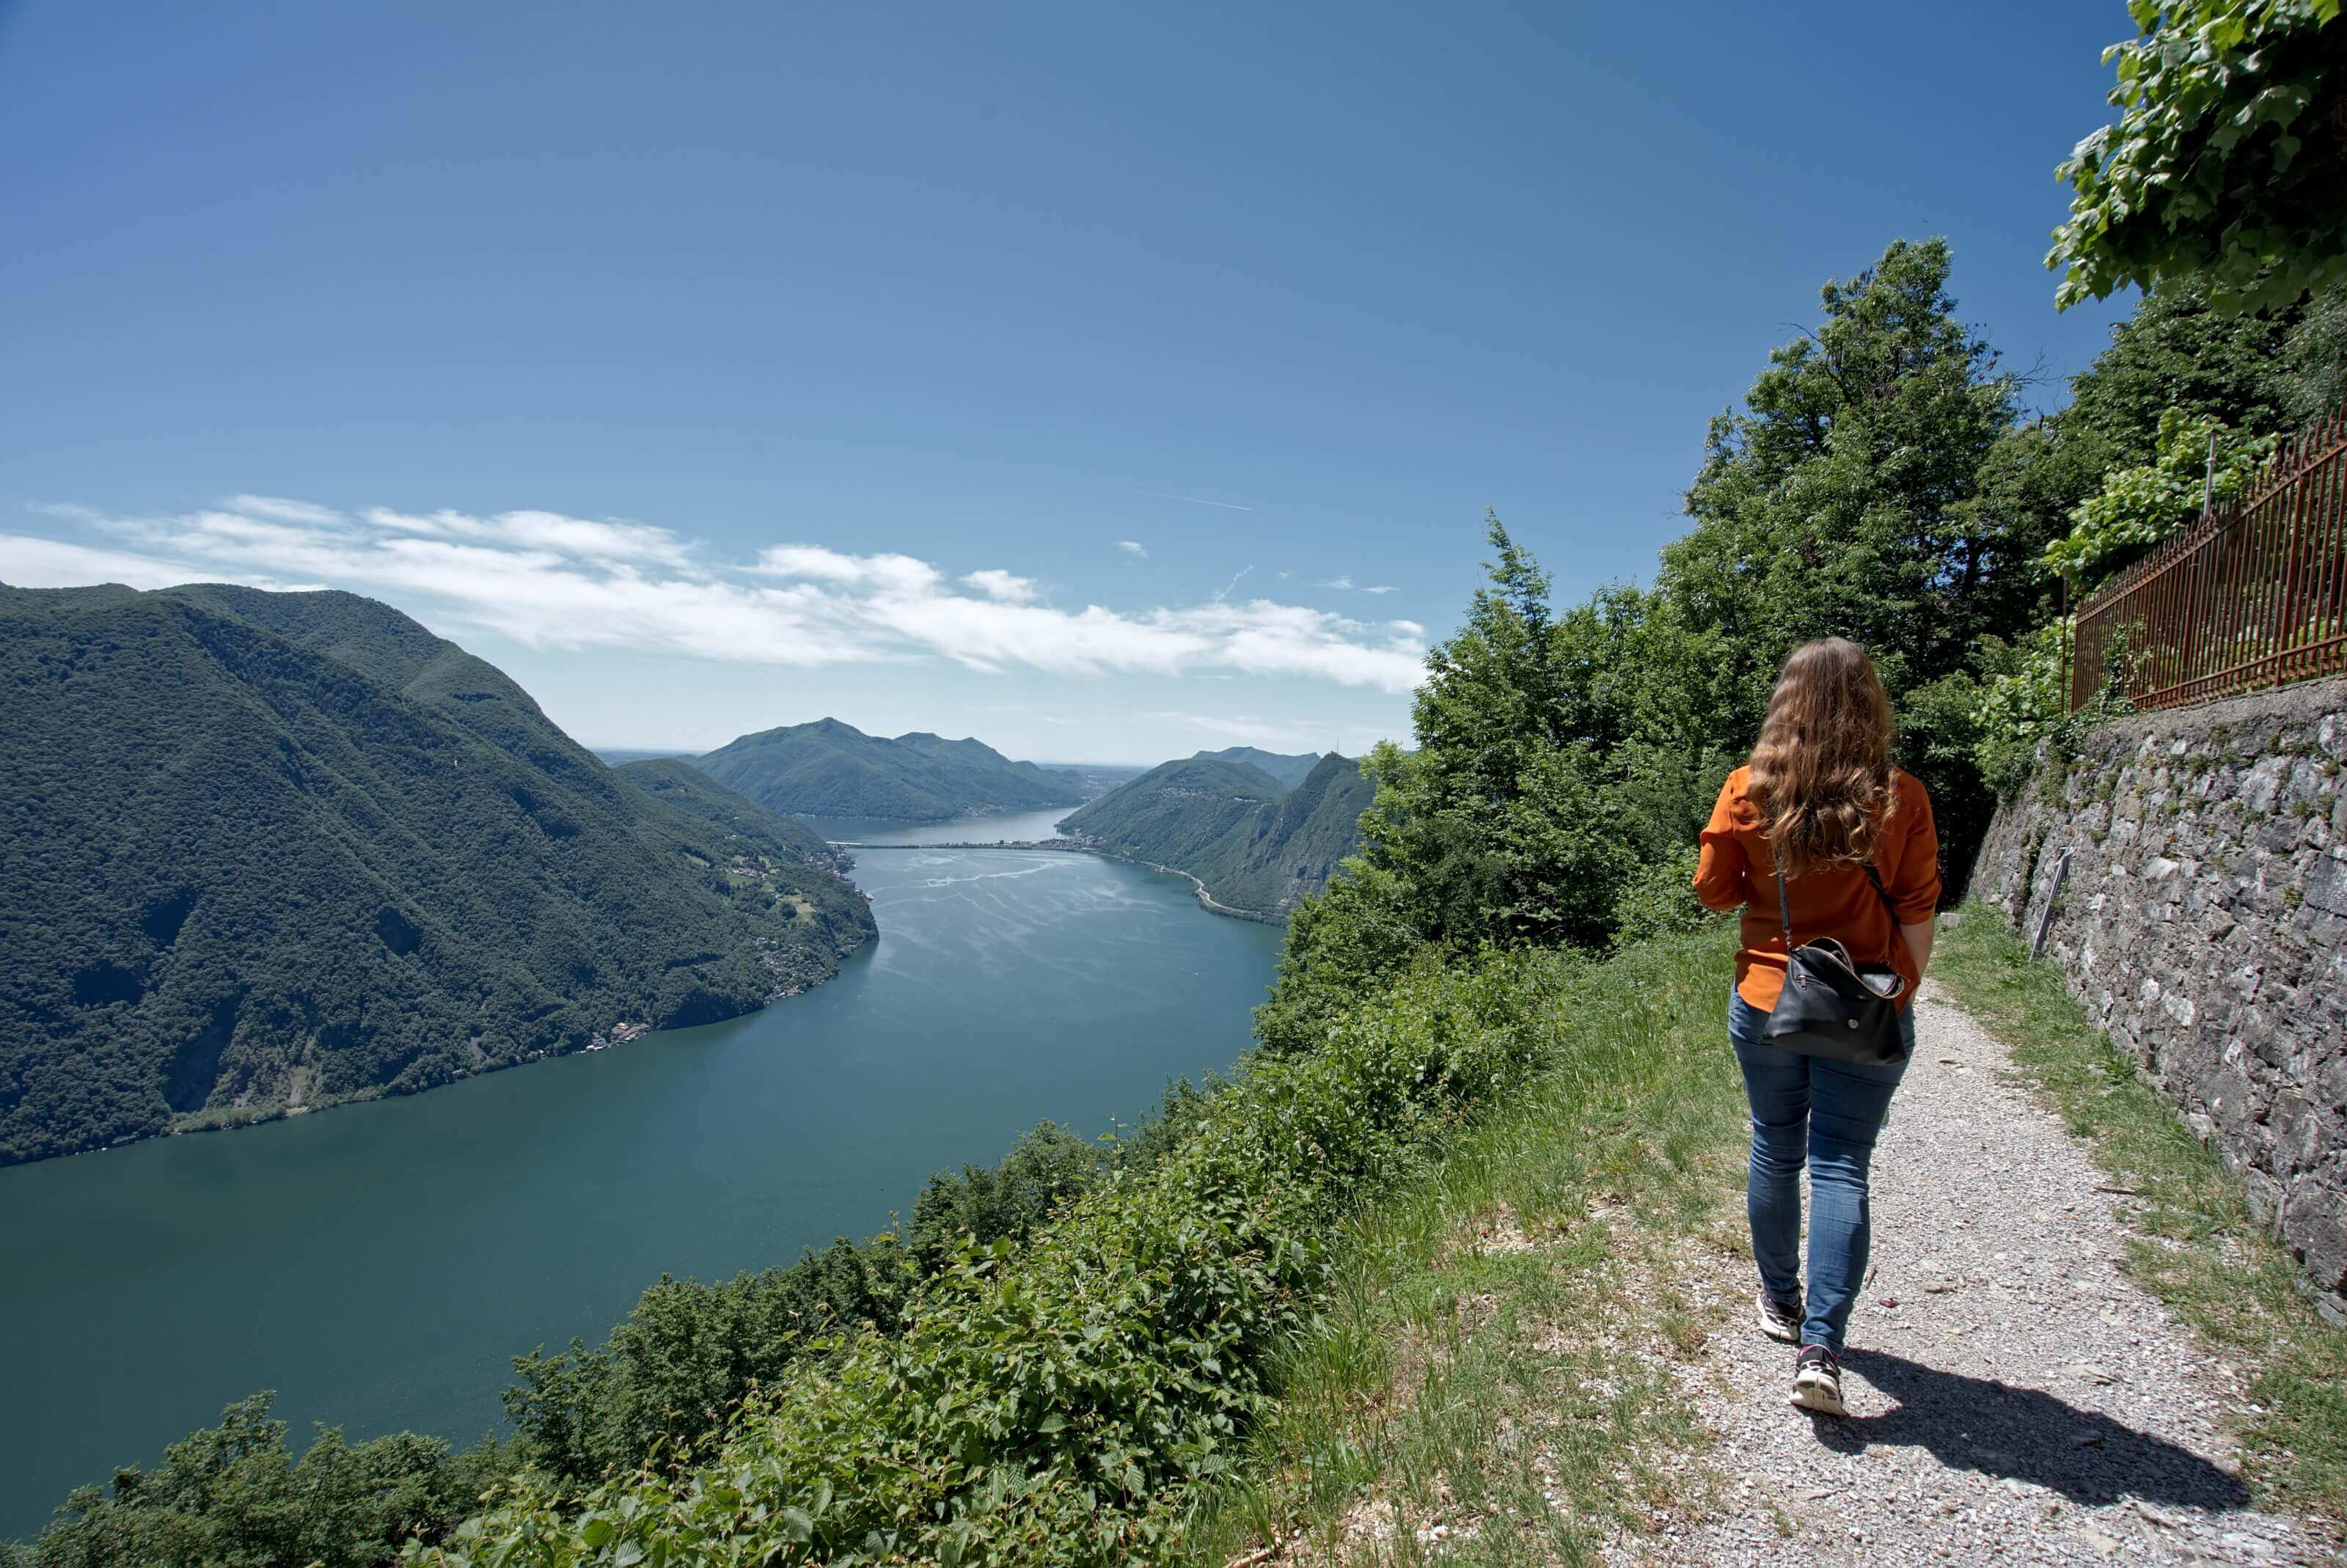 Getaway in Ticino: our 3 days in Monte Bre. Val Verzasca and Lavertezzo